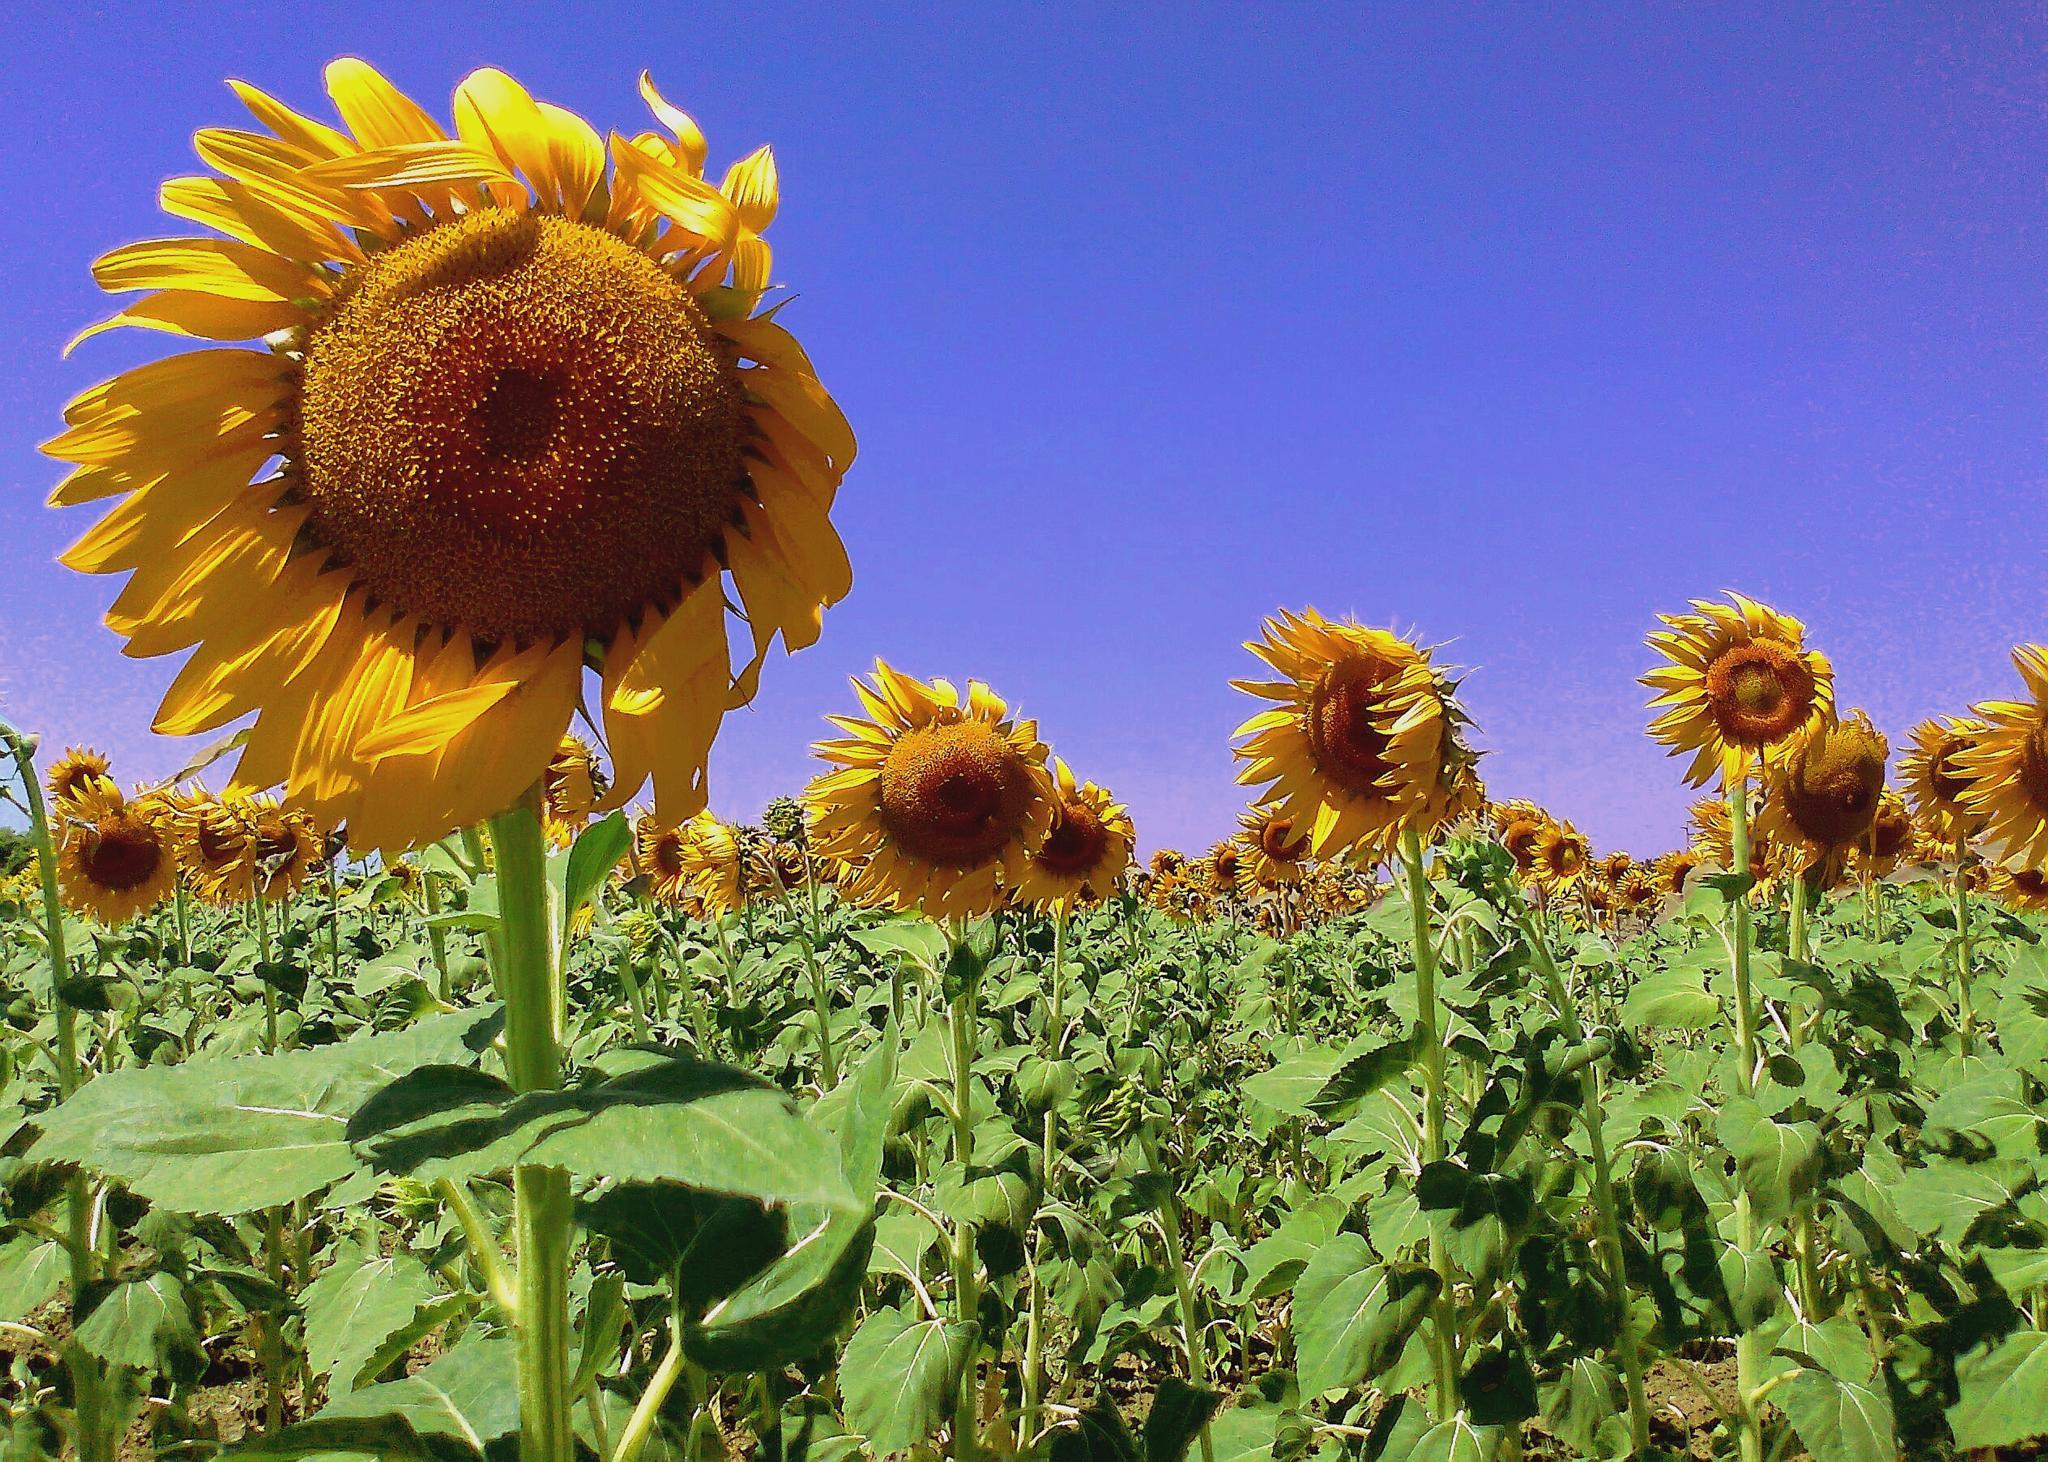 Sunflower. by massimo.fior.5